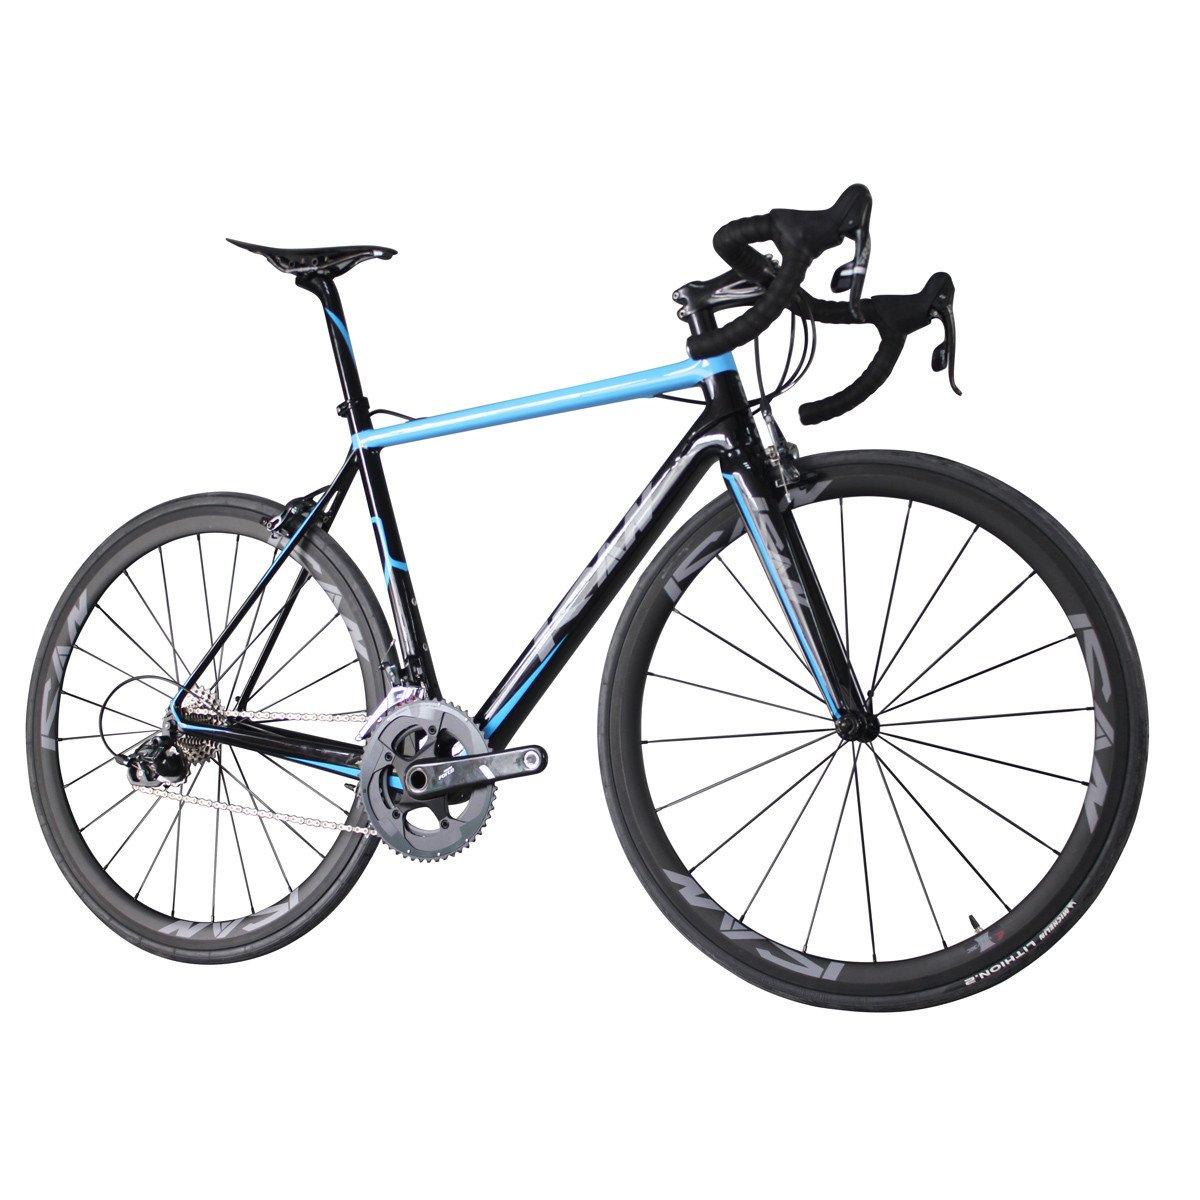 ICAN Carbon Road Bike